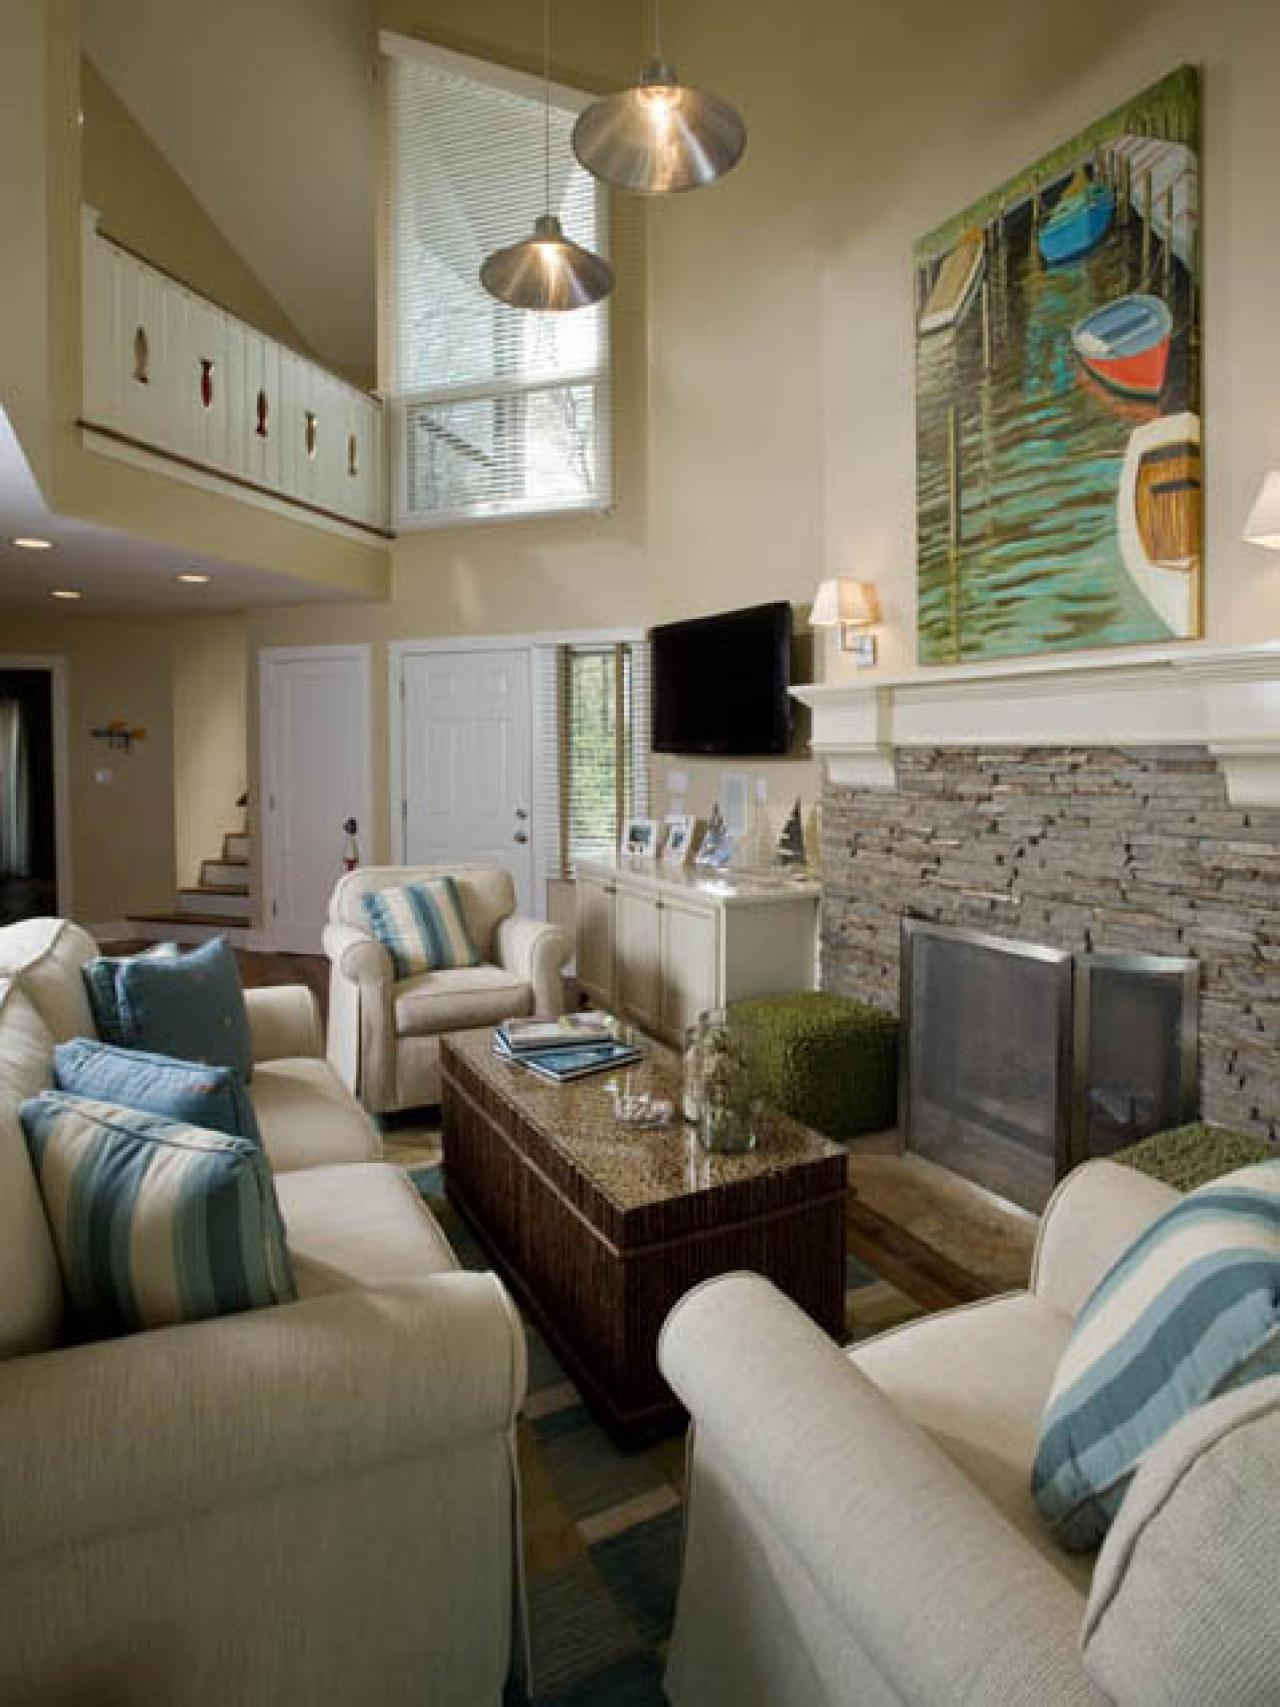 Coastal living room ideas living room and dining room - Living room artwork ideas ...